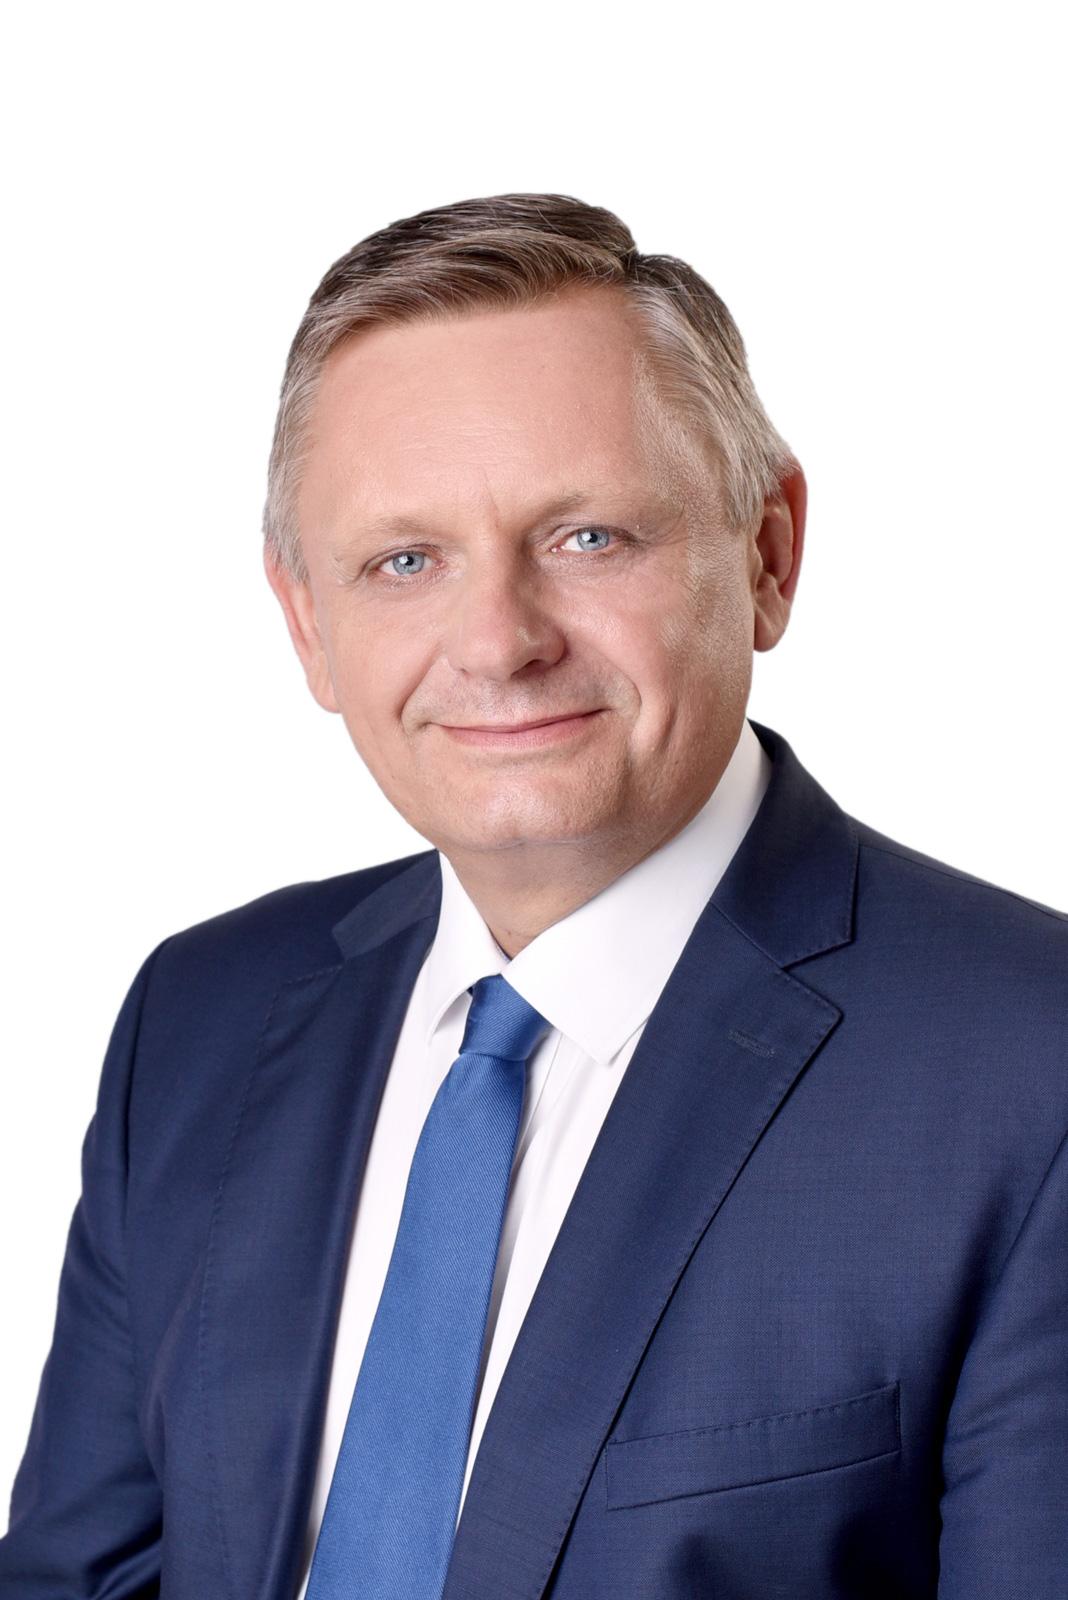 Piotr Jedliński